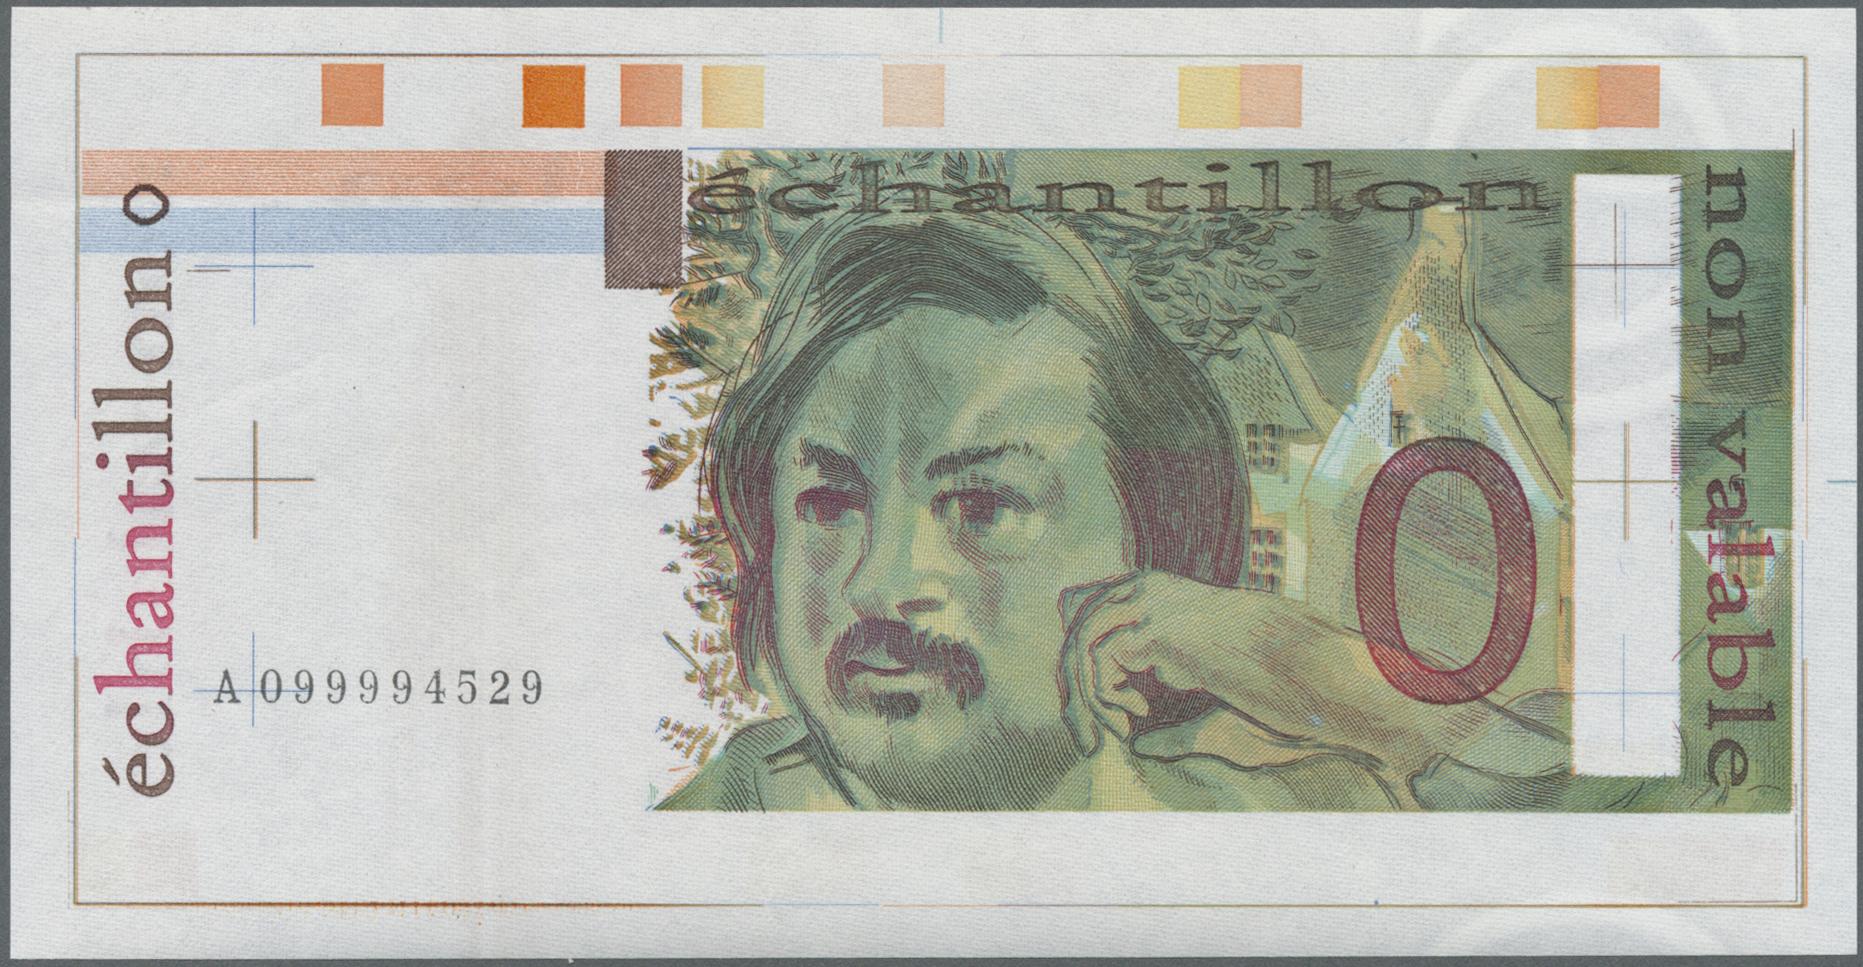 Lot 2311 - Testbanknoten | Banknoten  -  Auktionshaus Christoph Gärtner GmbH & Co. KG Banknotes & Coins Auction #39 Day 2